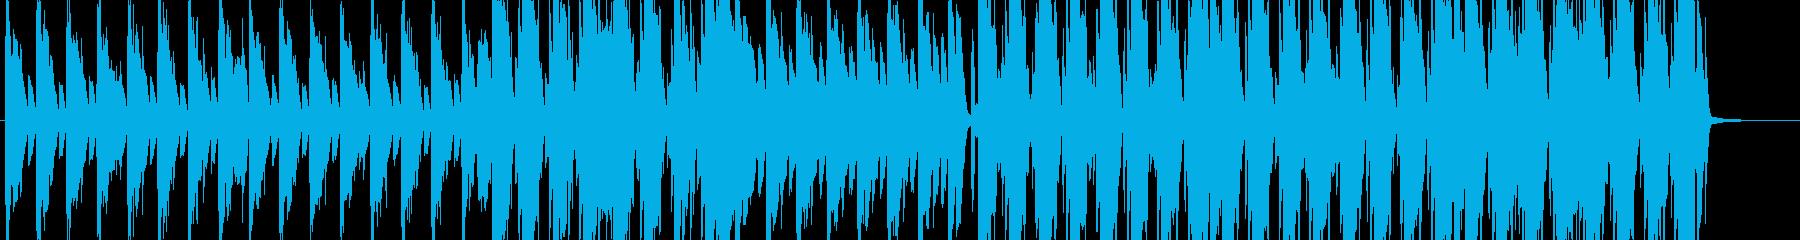 Kawaii×シャボン玉【歌なし】の再生済みの波形